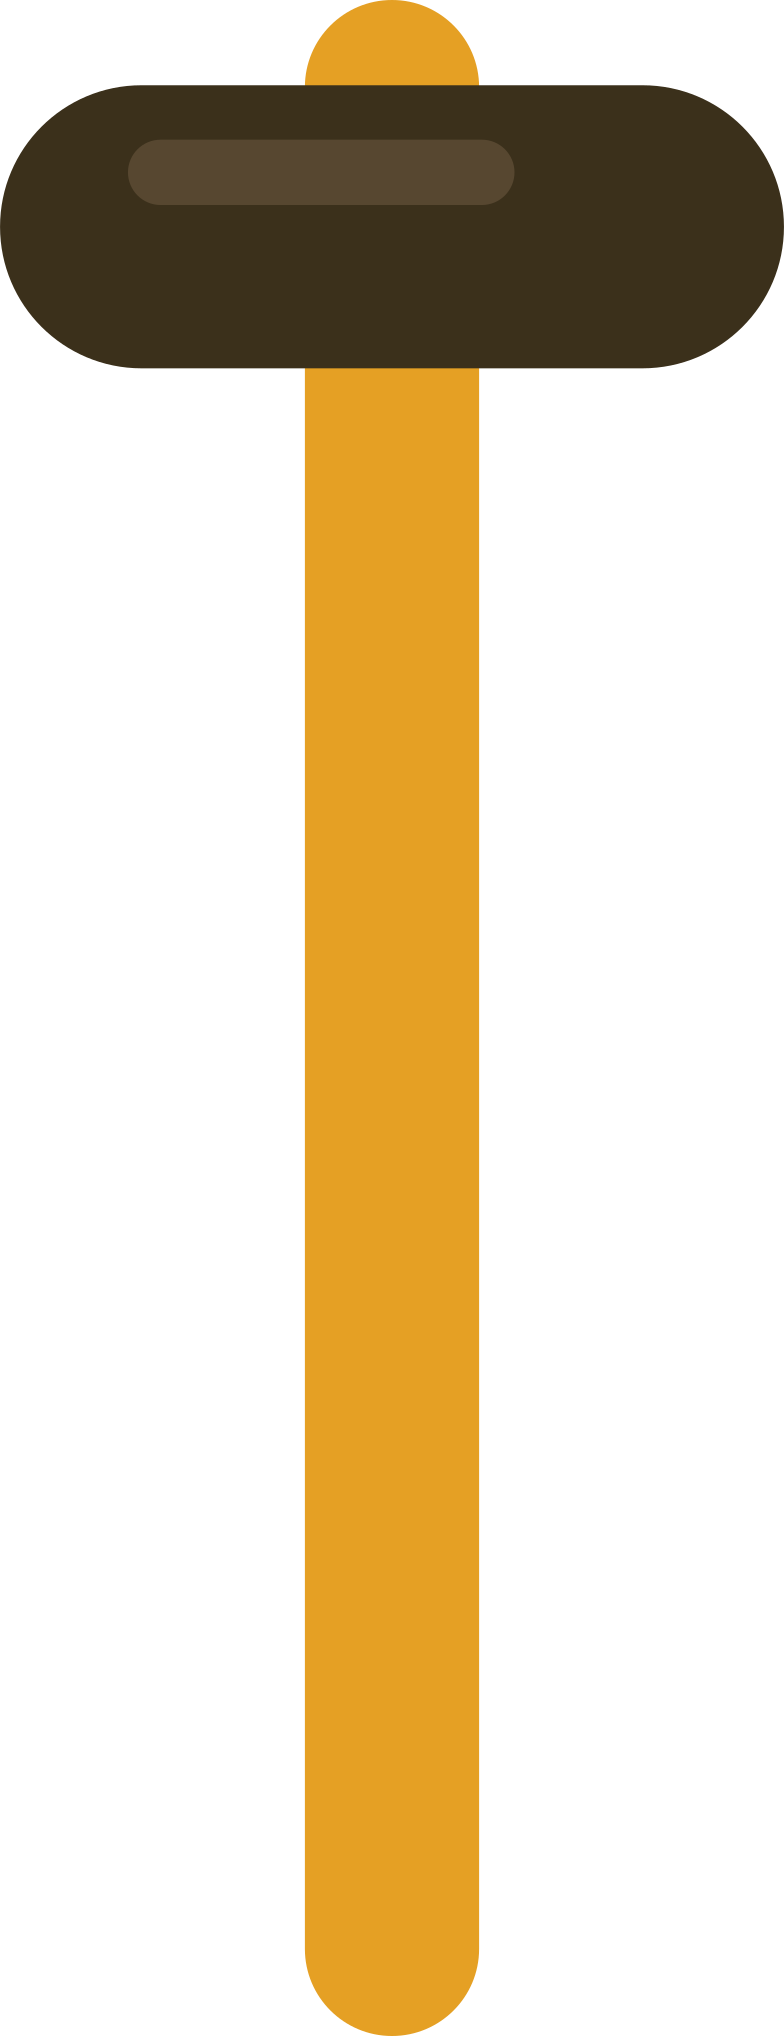 hammer sledgehammer Clipart illustration in PNG, SVG